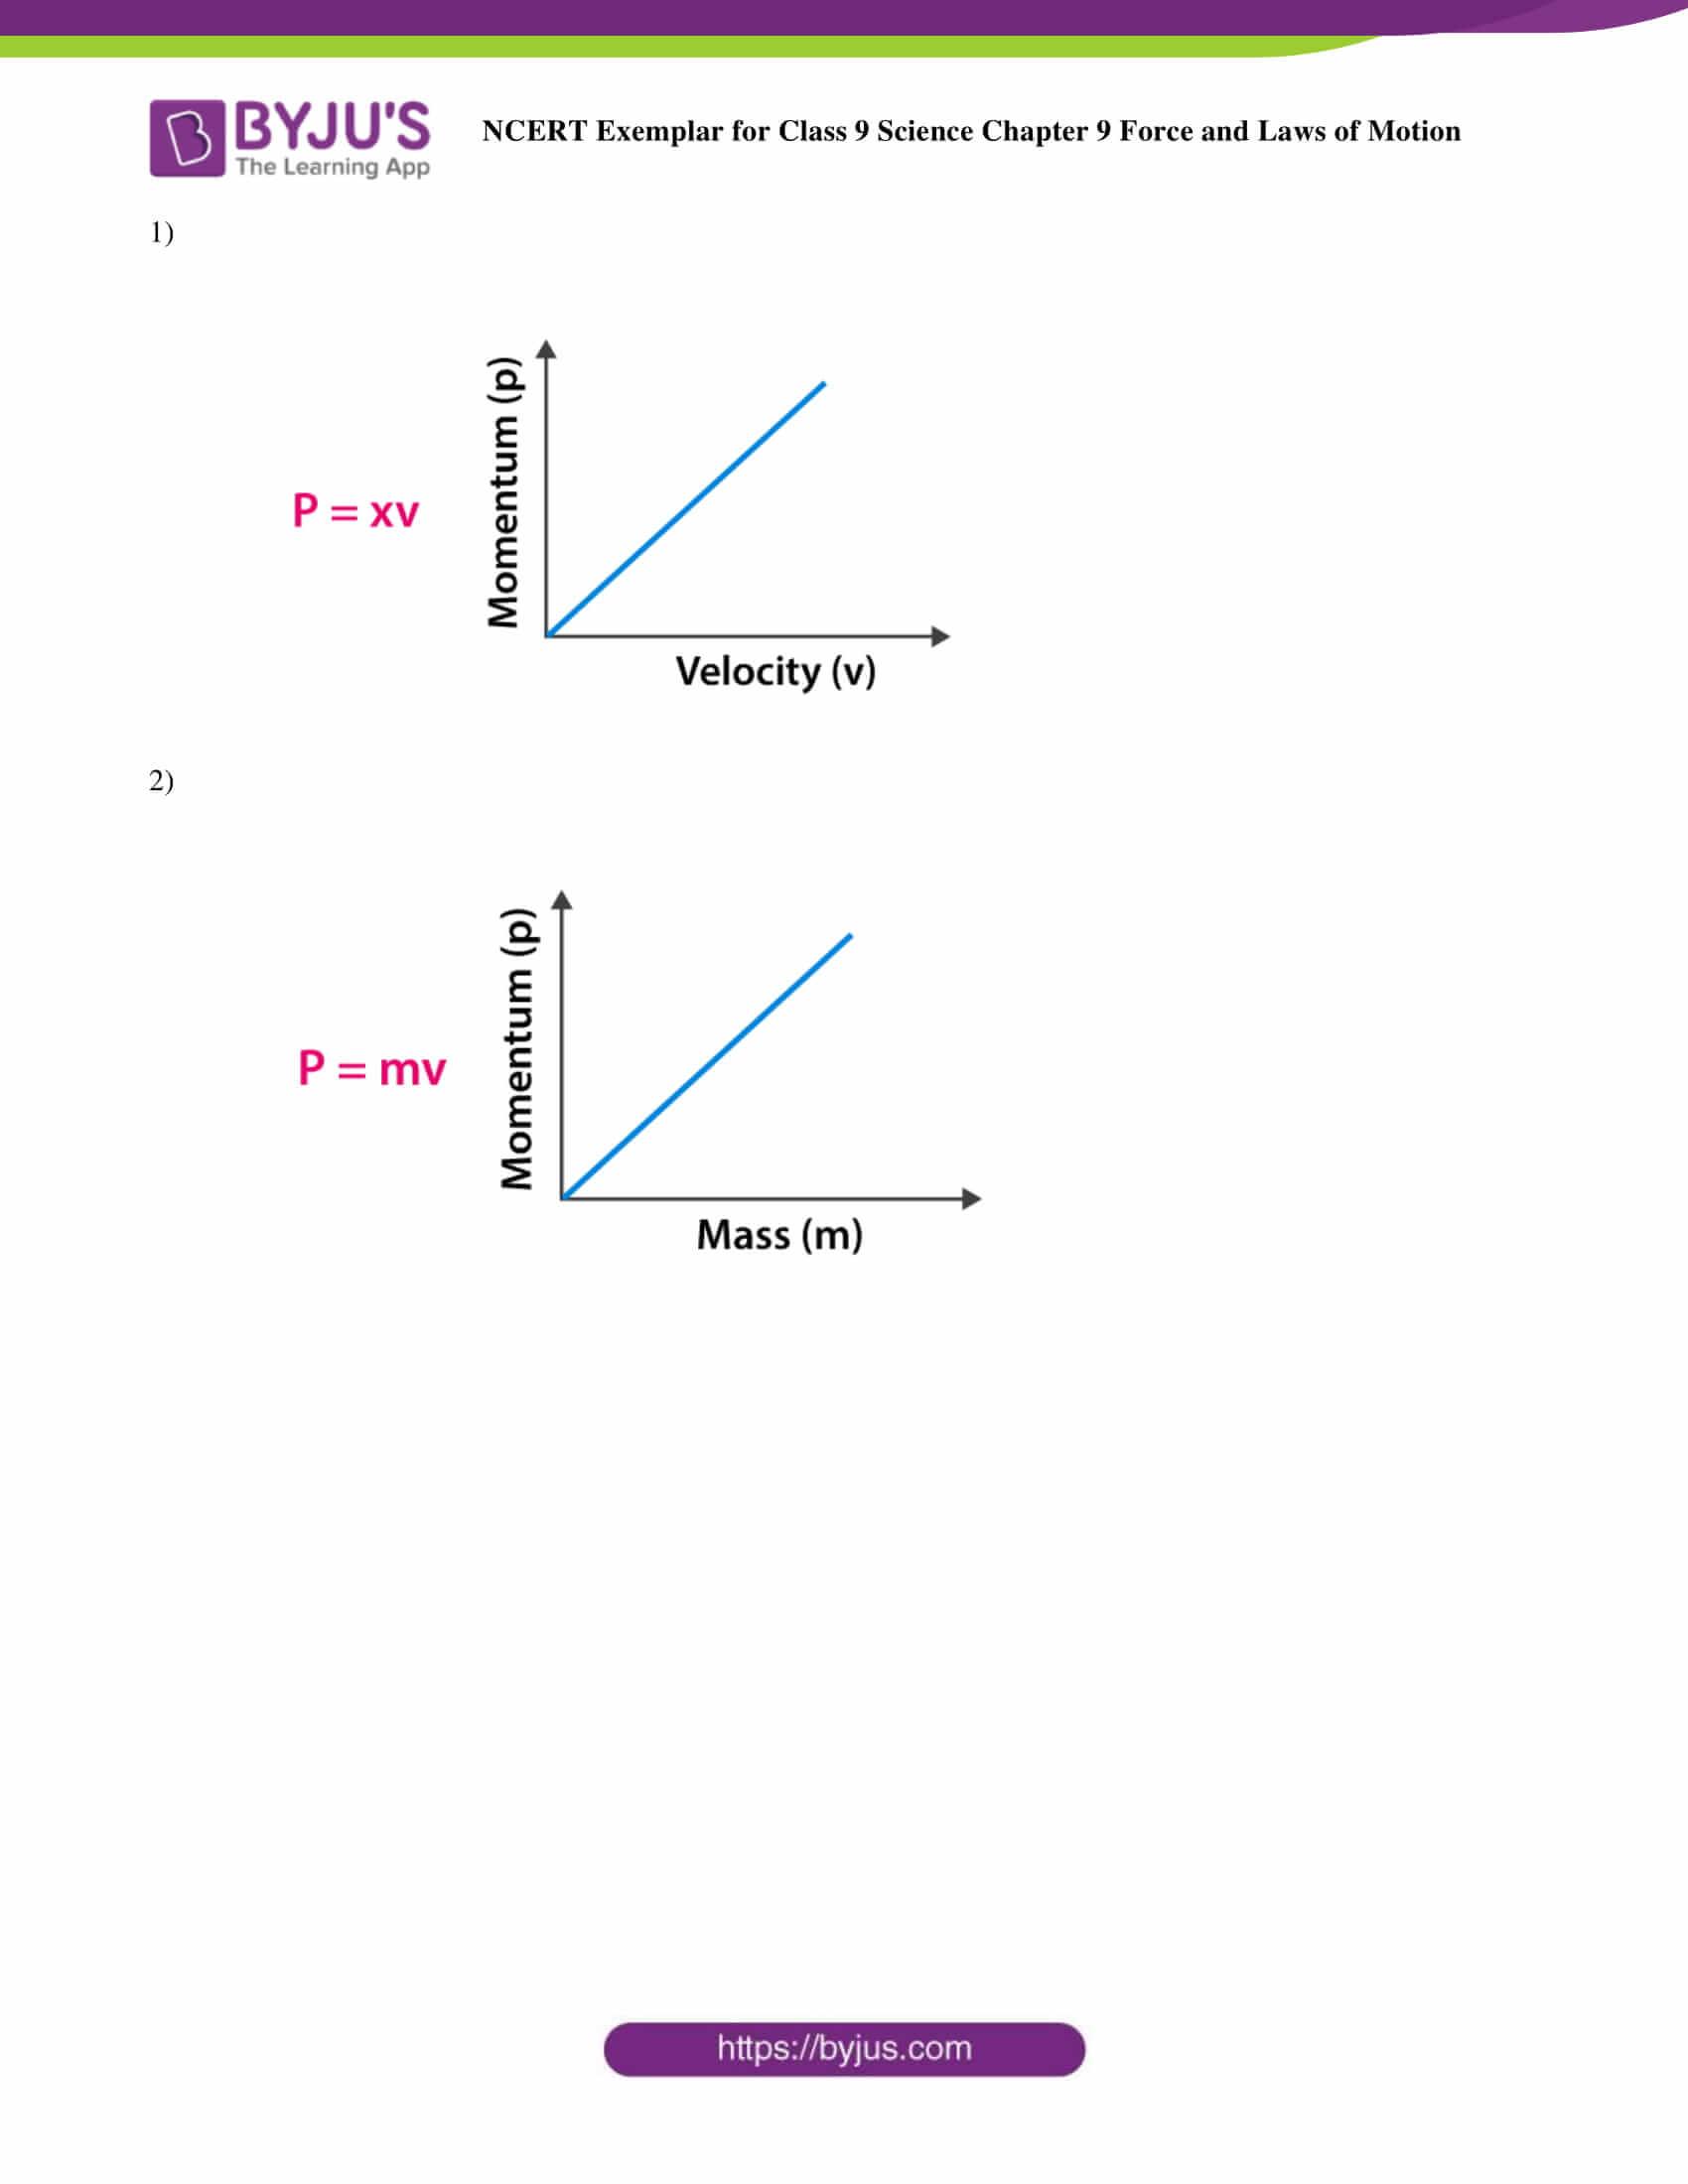 NCERT Exemplar solution class 9 scienceChapter 9 part 8